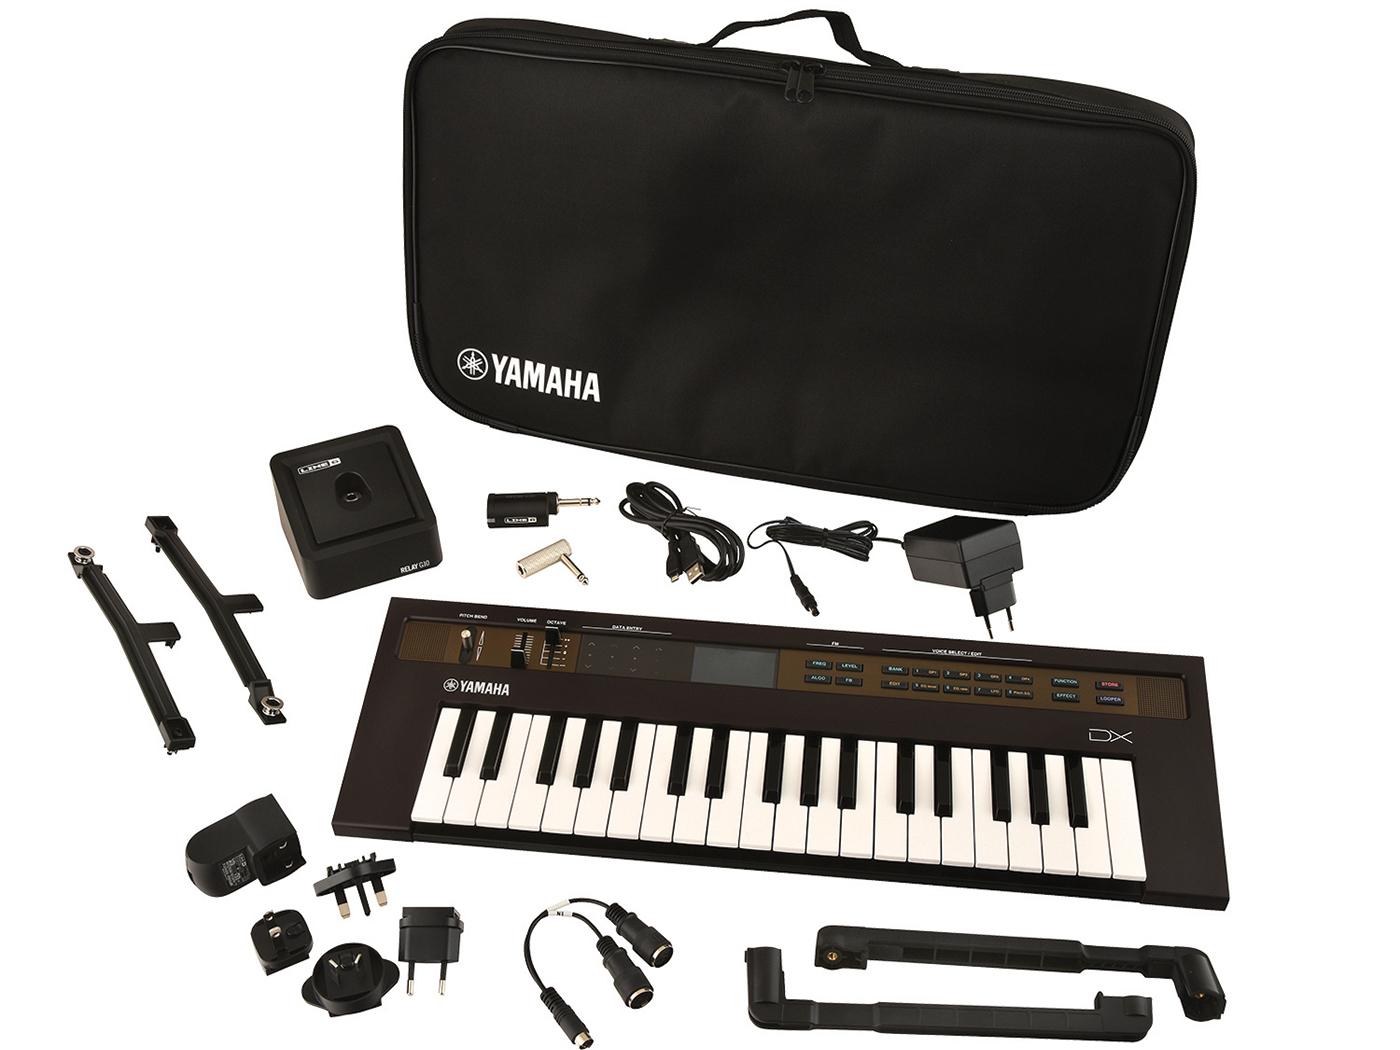 Yamaha Reface DX Keytar bundle